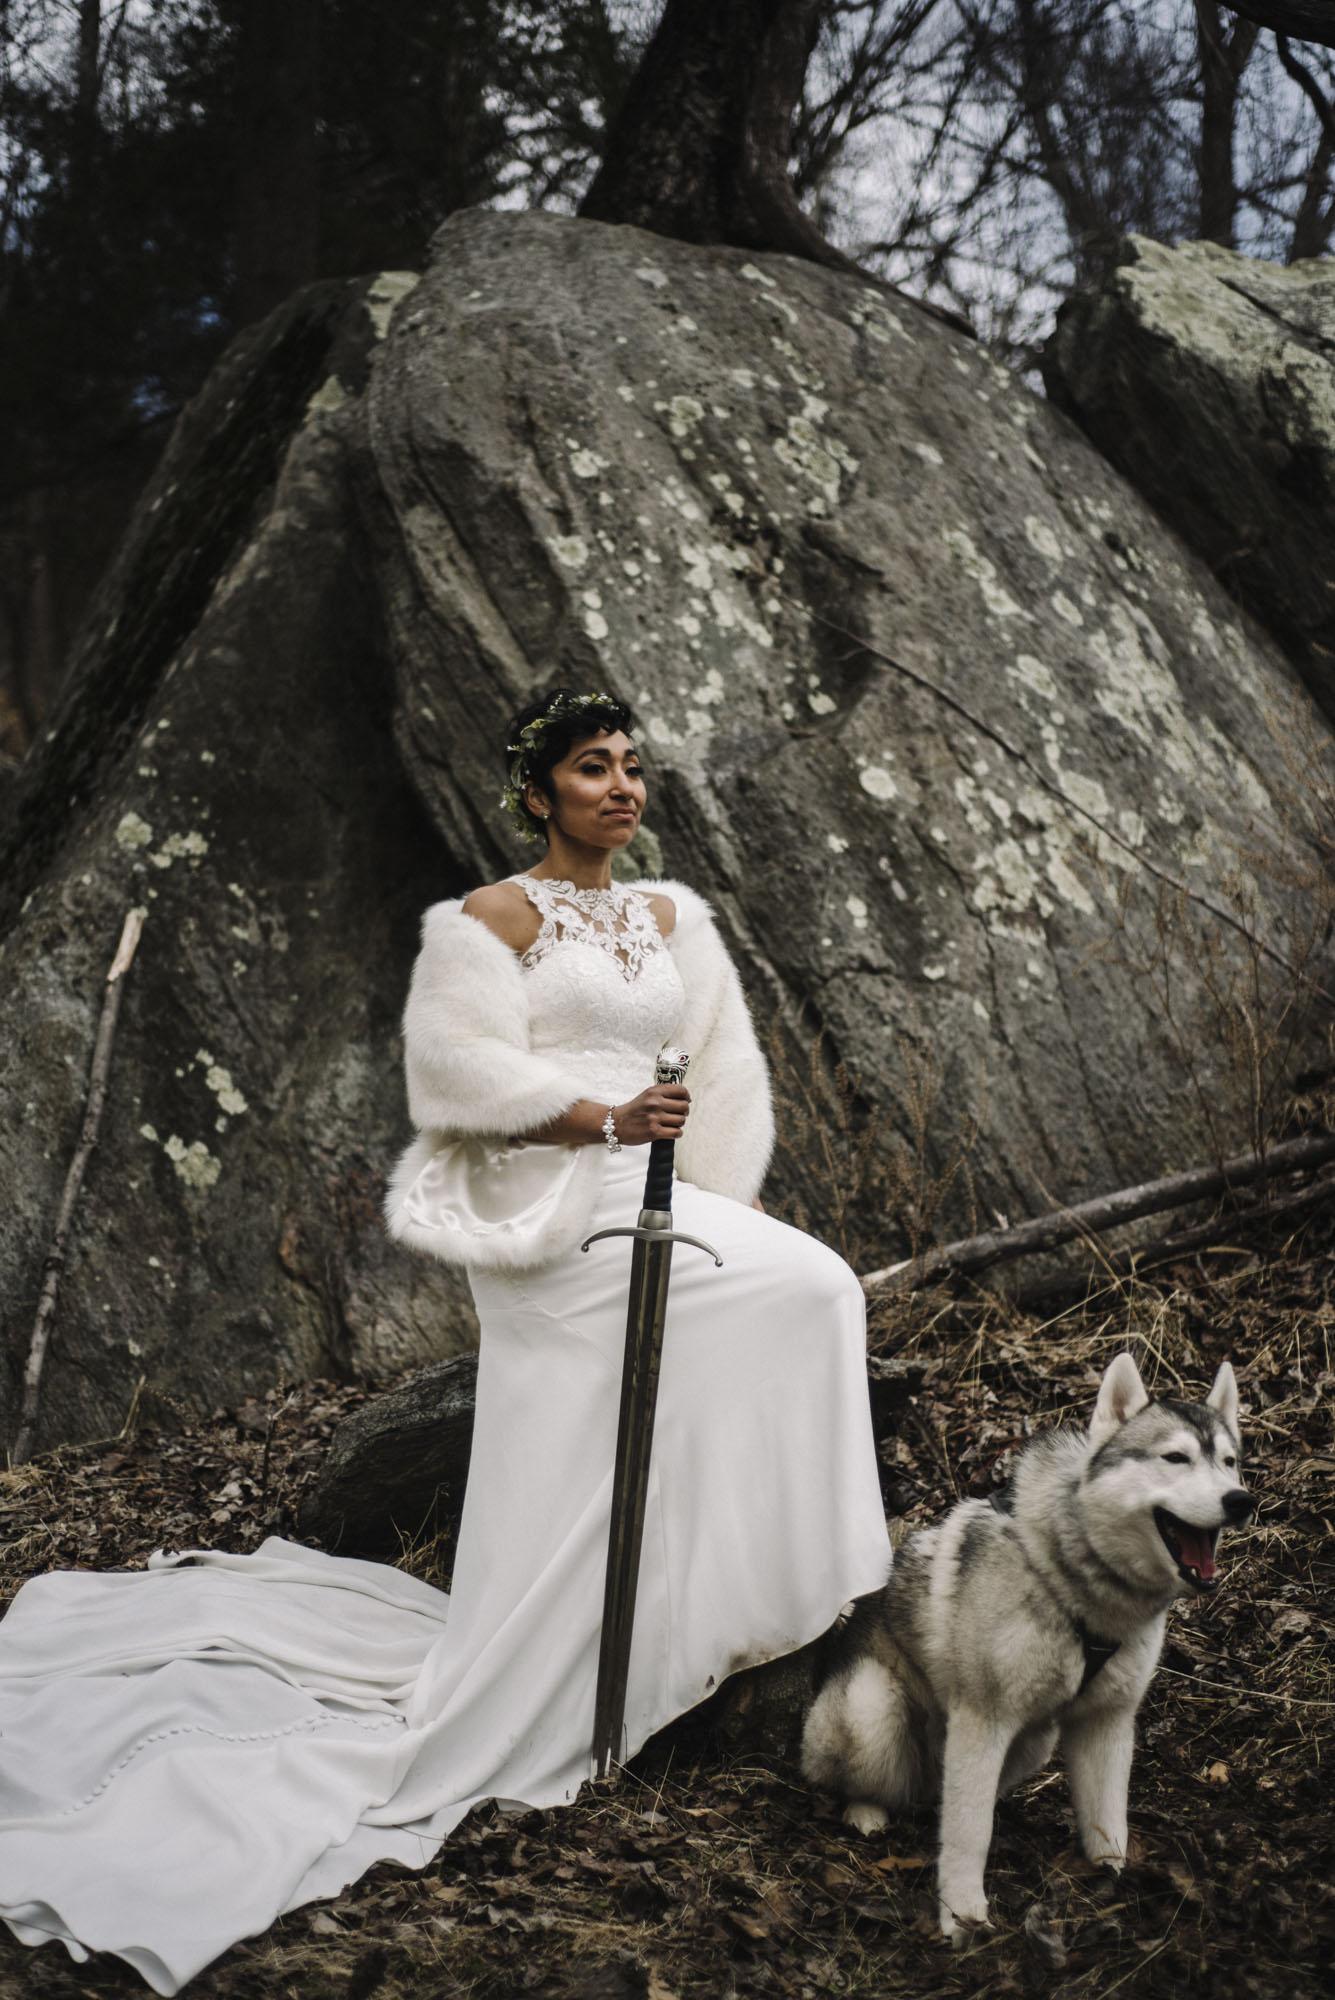 Game of Thrones Elopement - Winter Elopement - Shenandoah National Park Elopement Photographer - Virginia Adventure Photographer - Blue Ridge Parkway Elopement Photographer_48.jpg